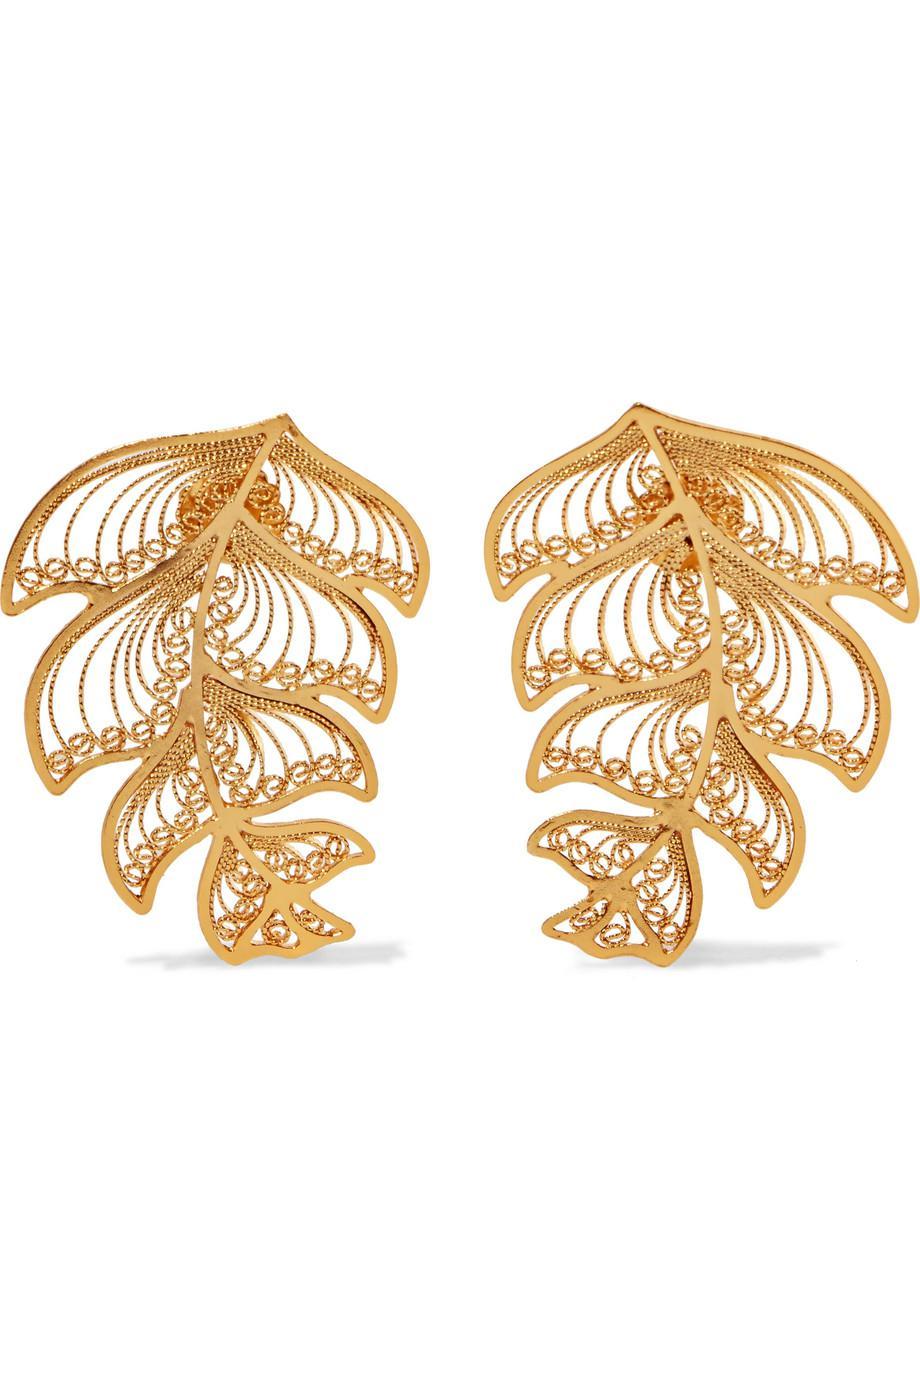 Mallarino Erika Gold Vermeil Earrings JWCO2UhC